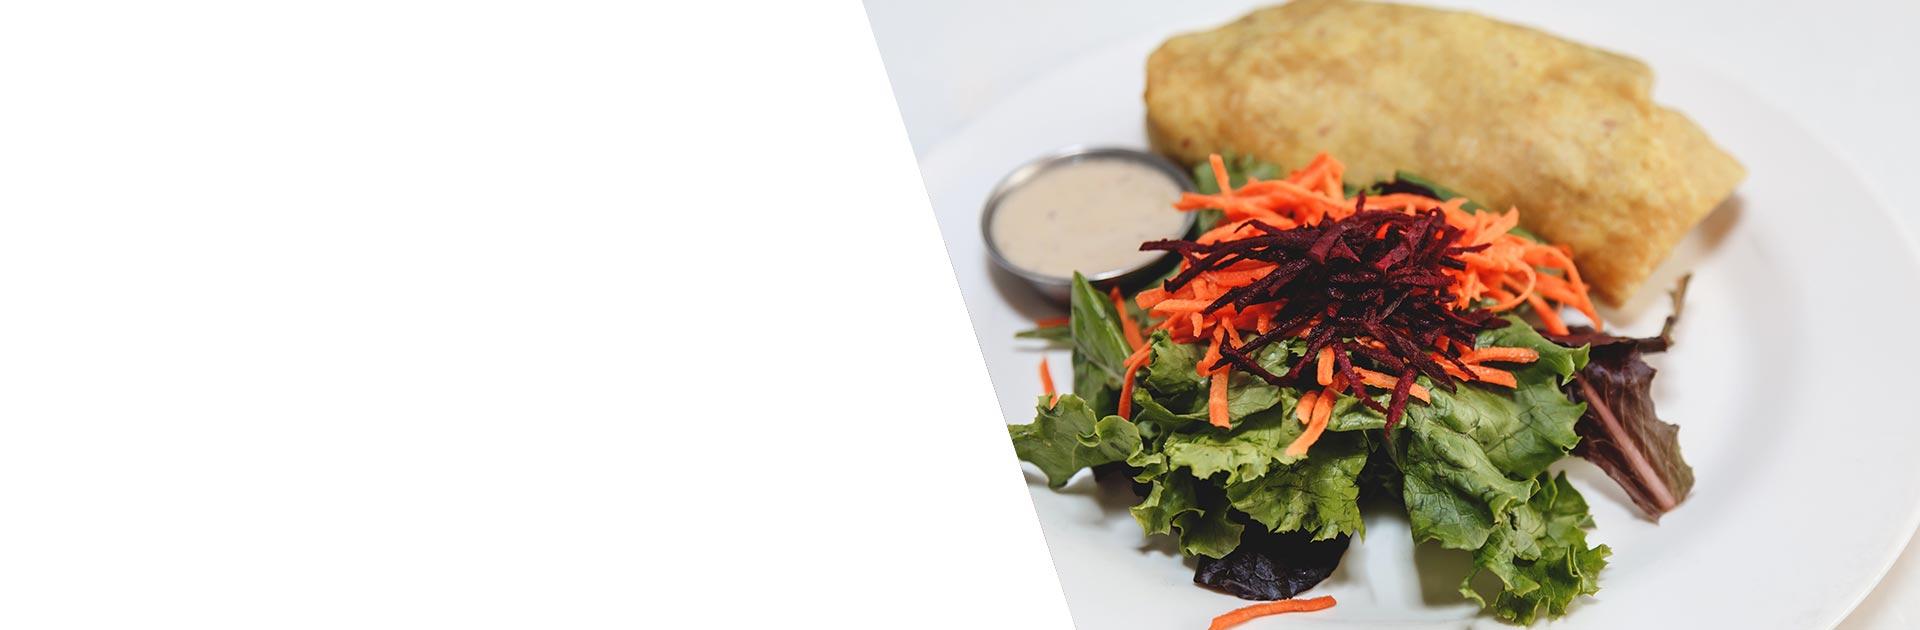 Ananda Fuara Vegetarian Restaurant San Francisco